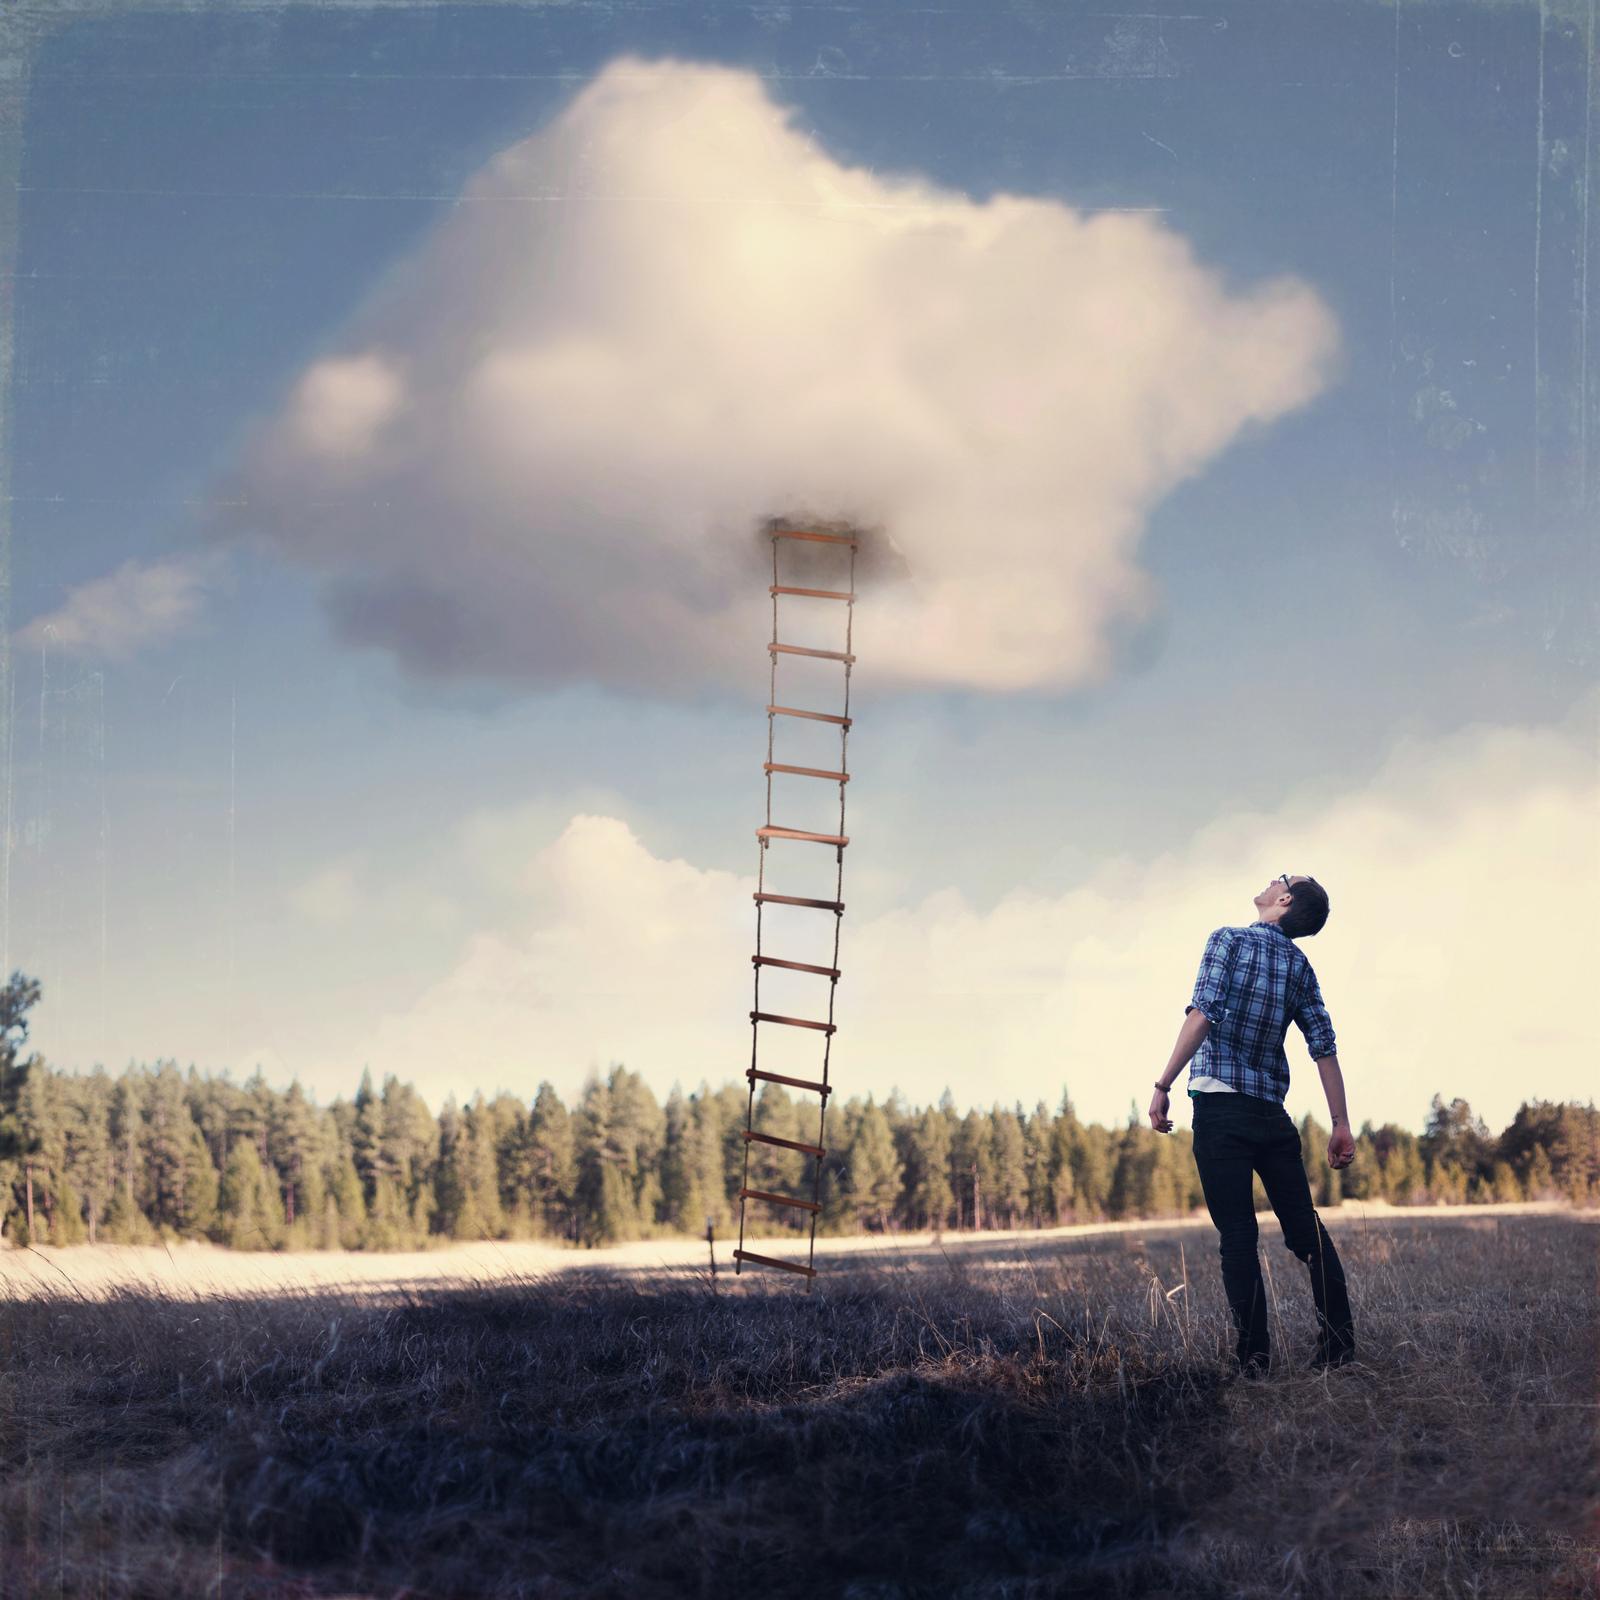 joel-robinson-sky-ladder